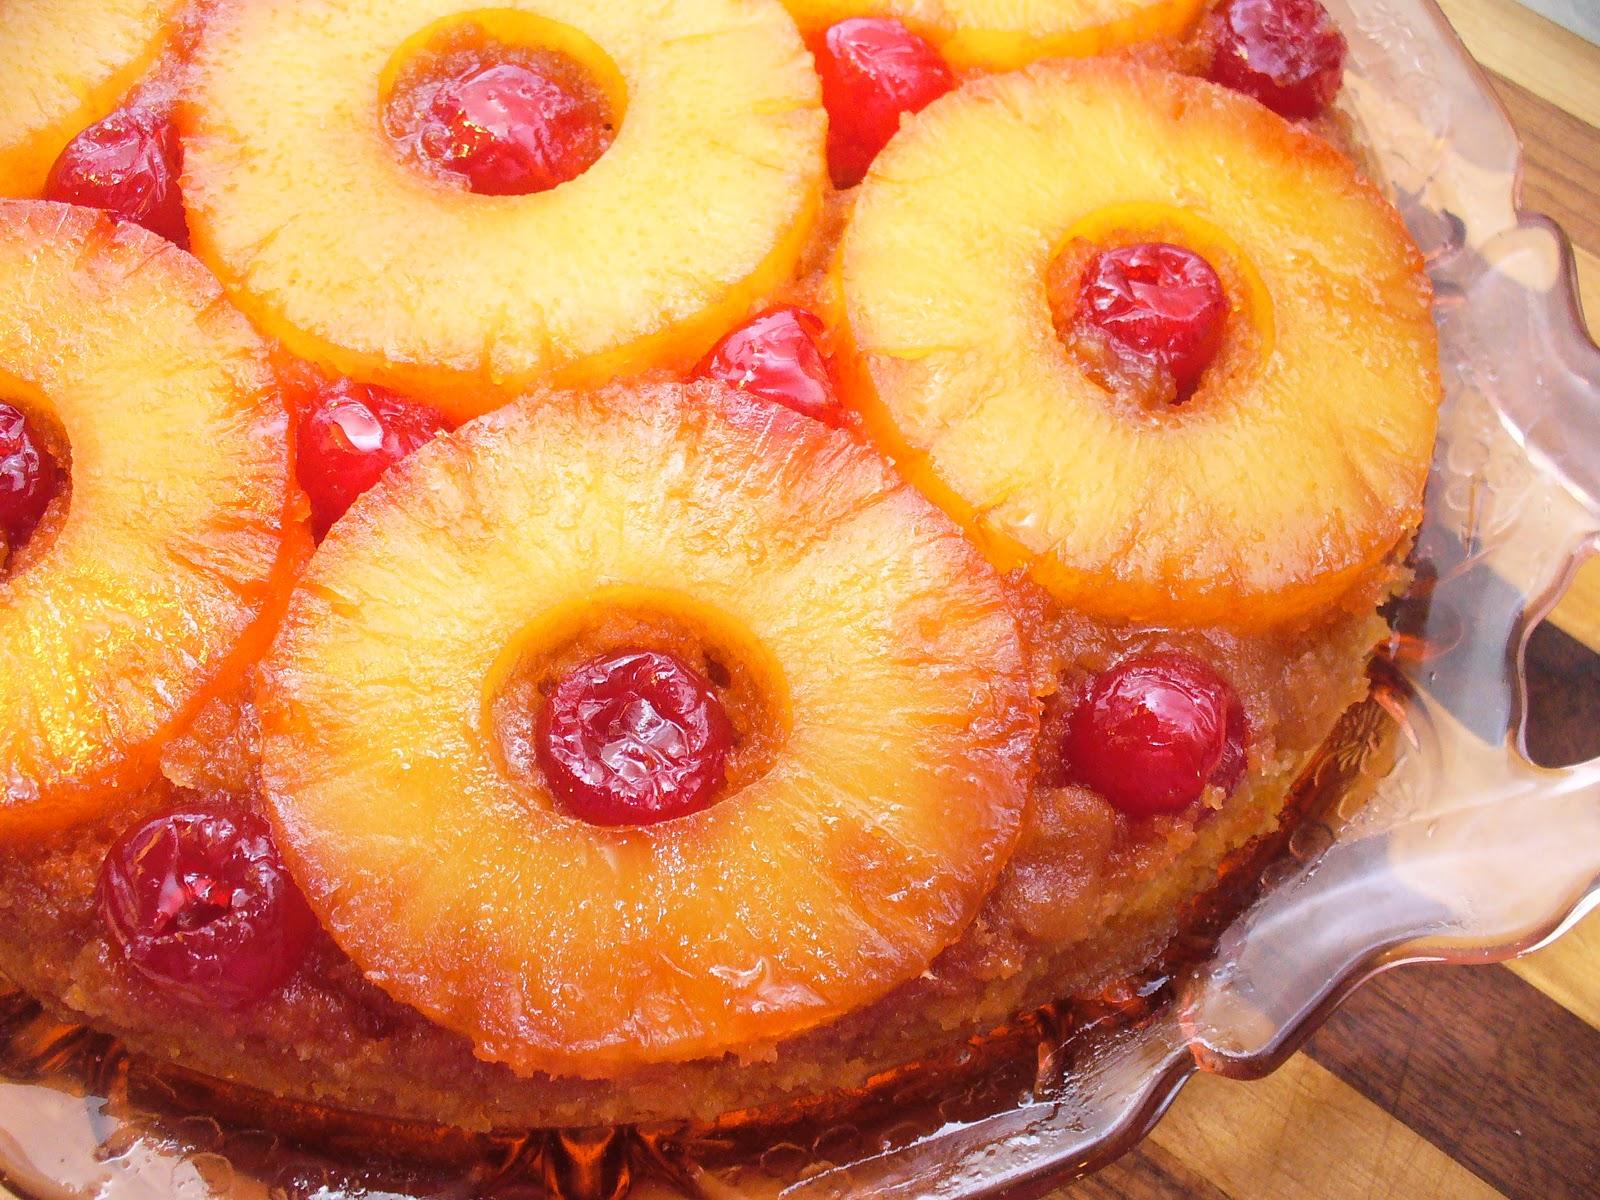 Photo Courtesy of Leenee's Sweetest Delights Blog